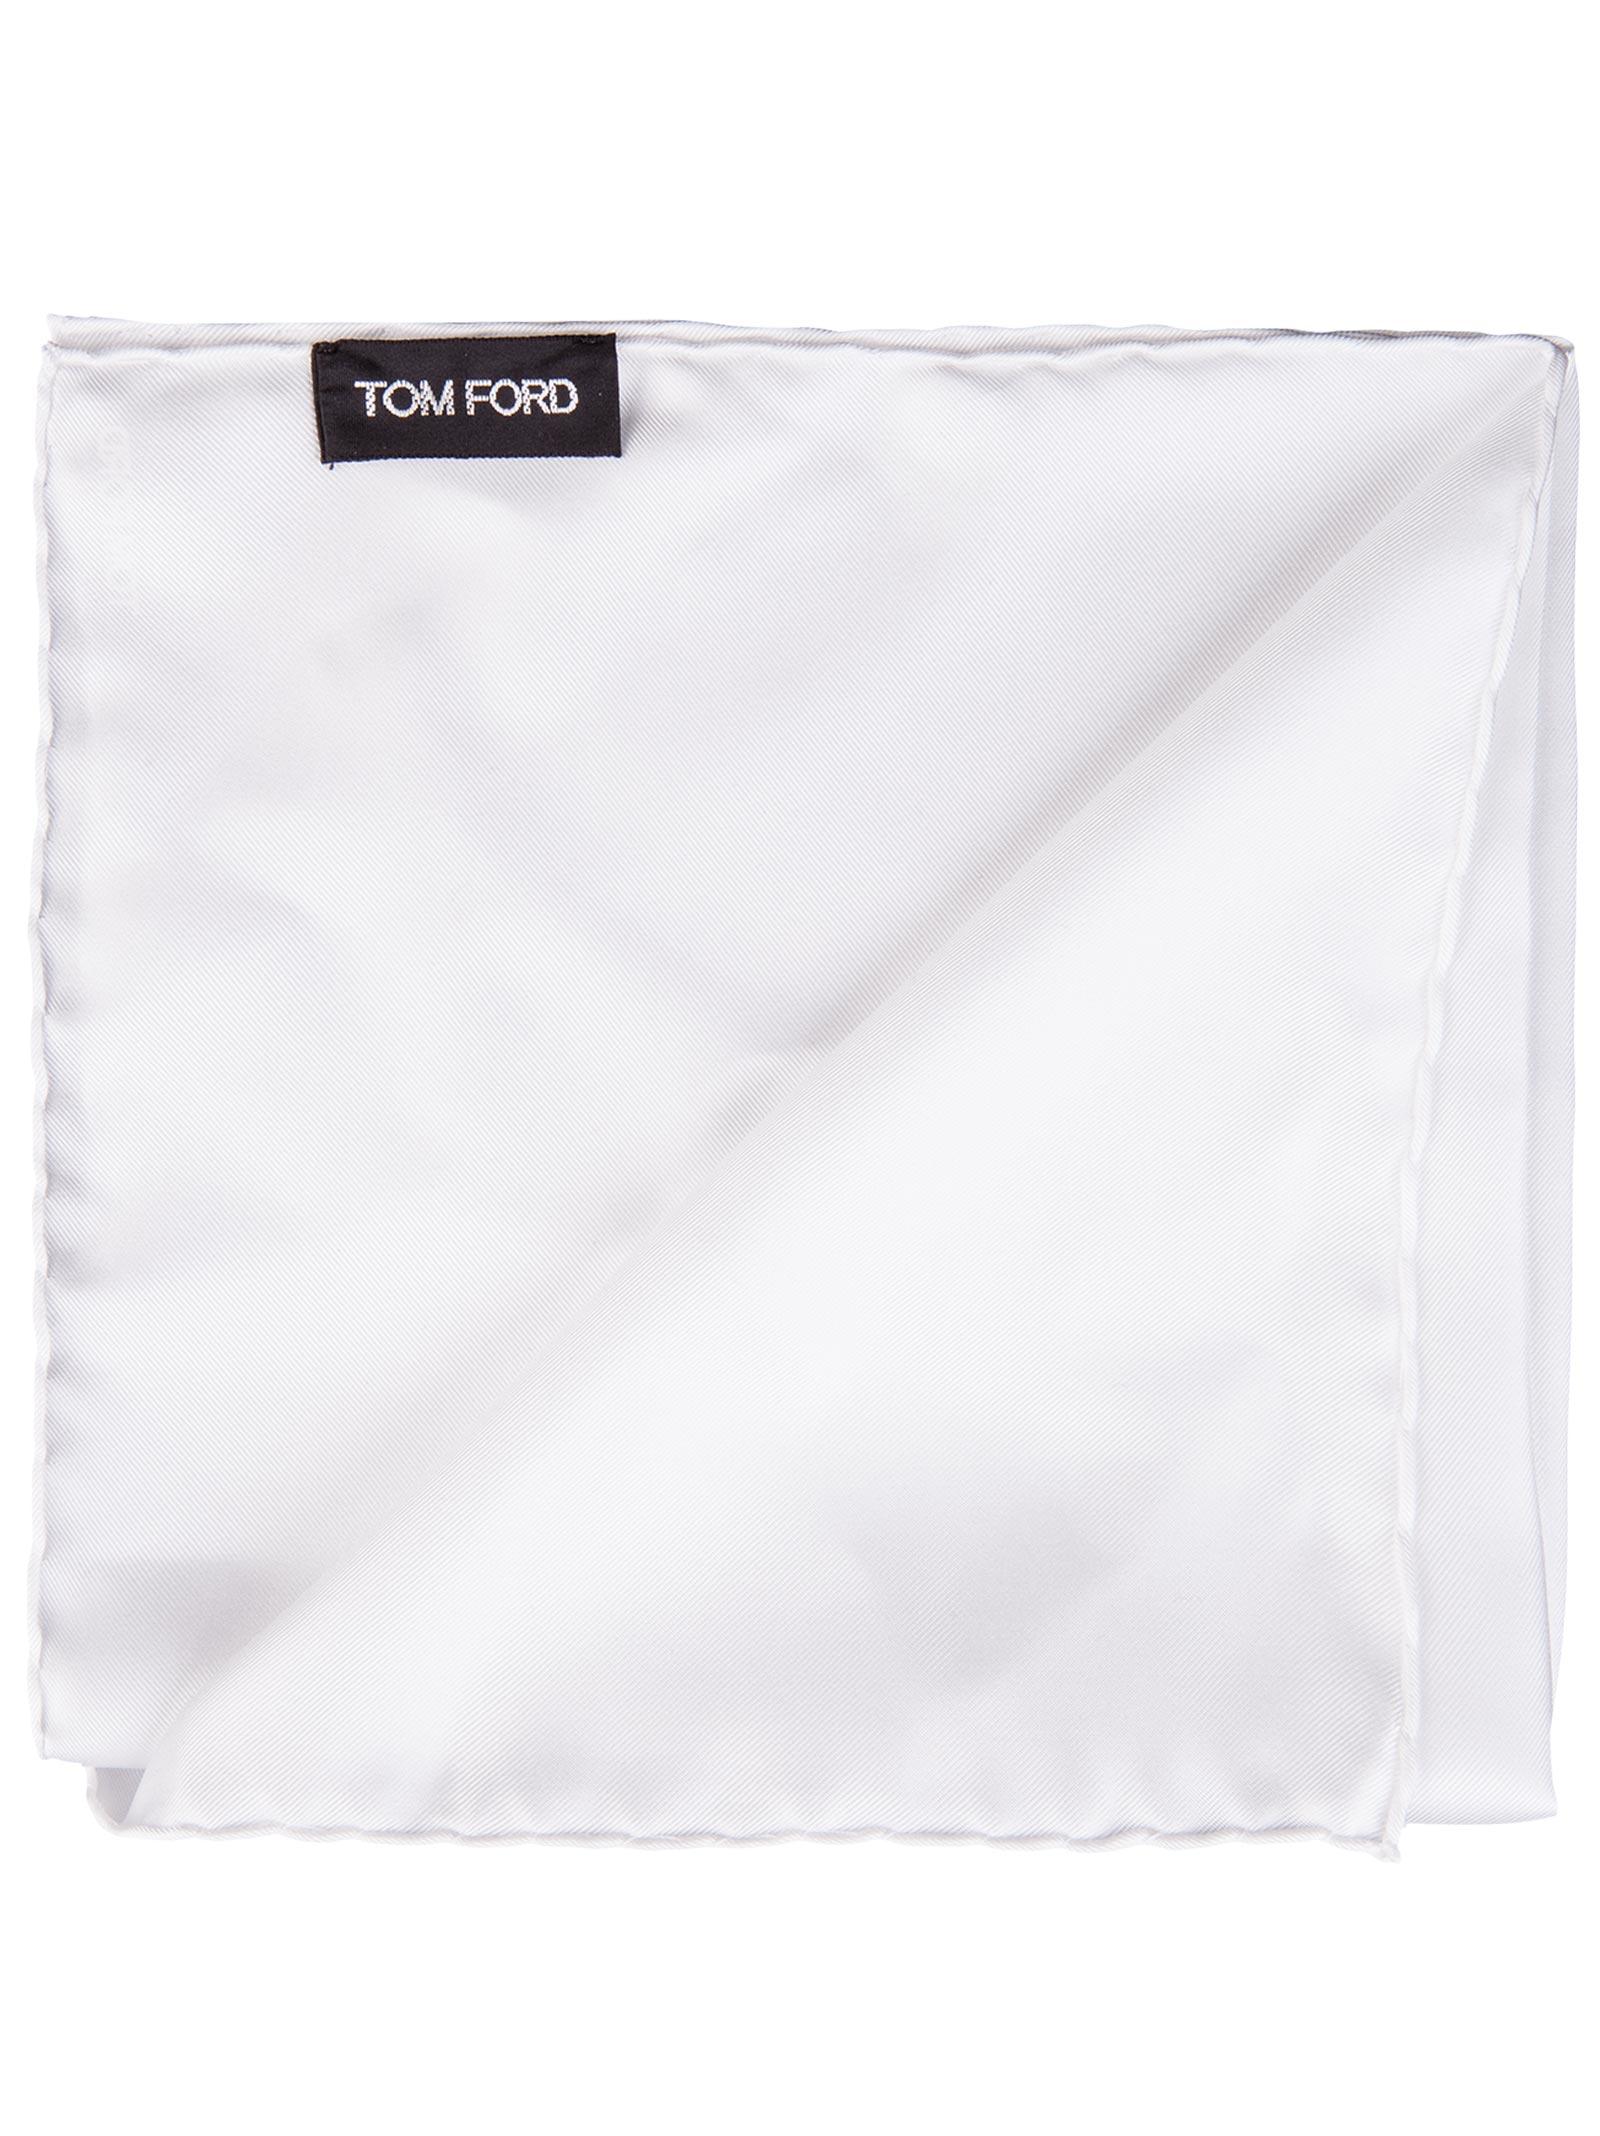 Tom ford pochette